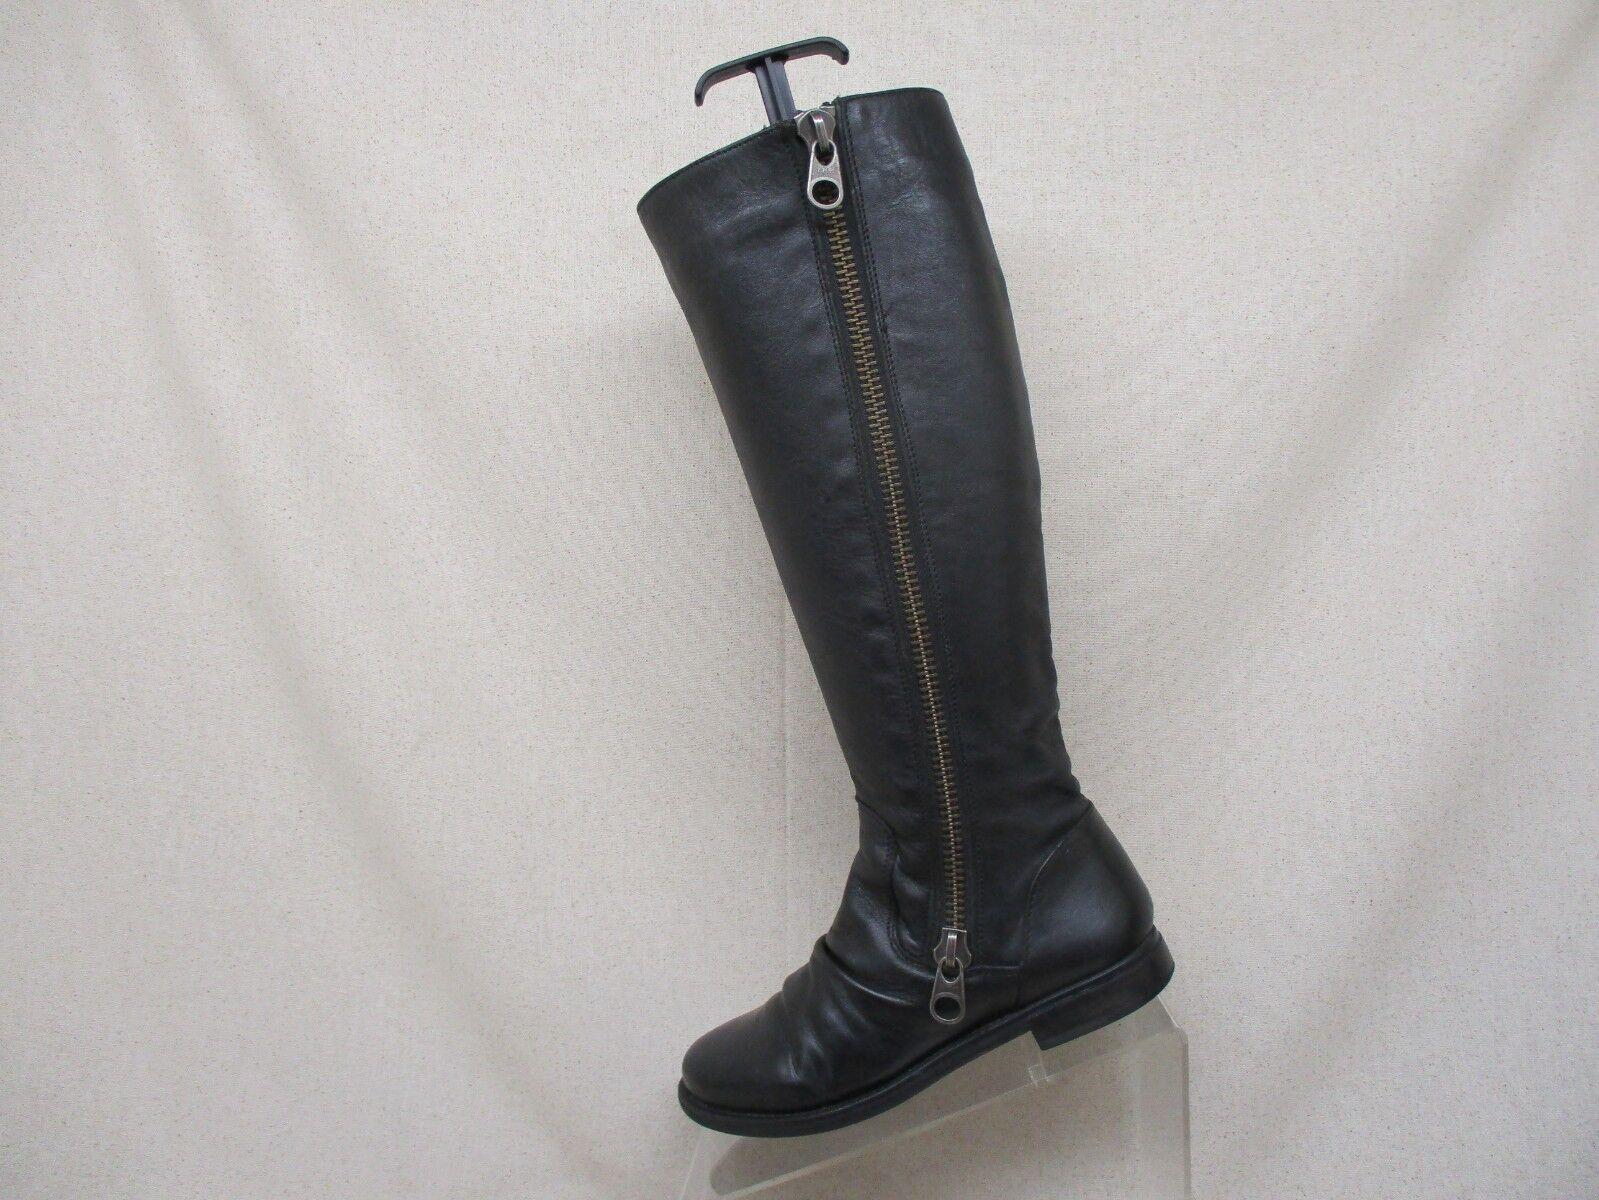 Steve Madden Black Leather Side Zip Knee High Fashion Boots Size 5.5 M - Linderr